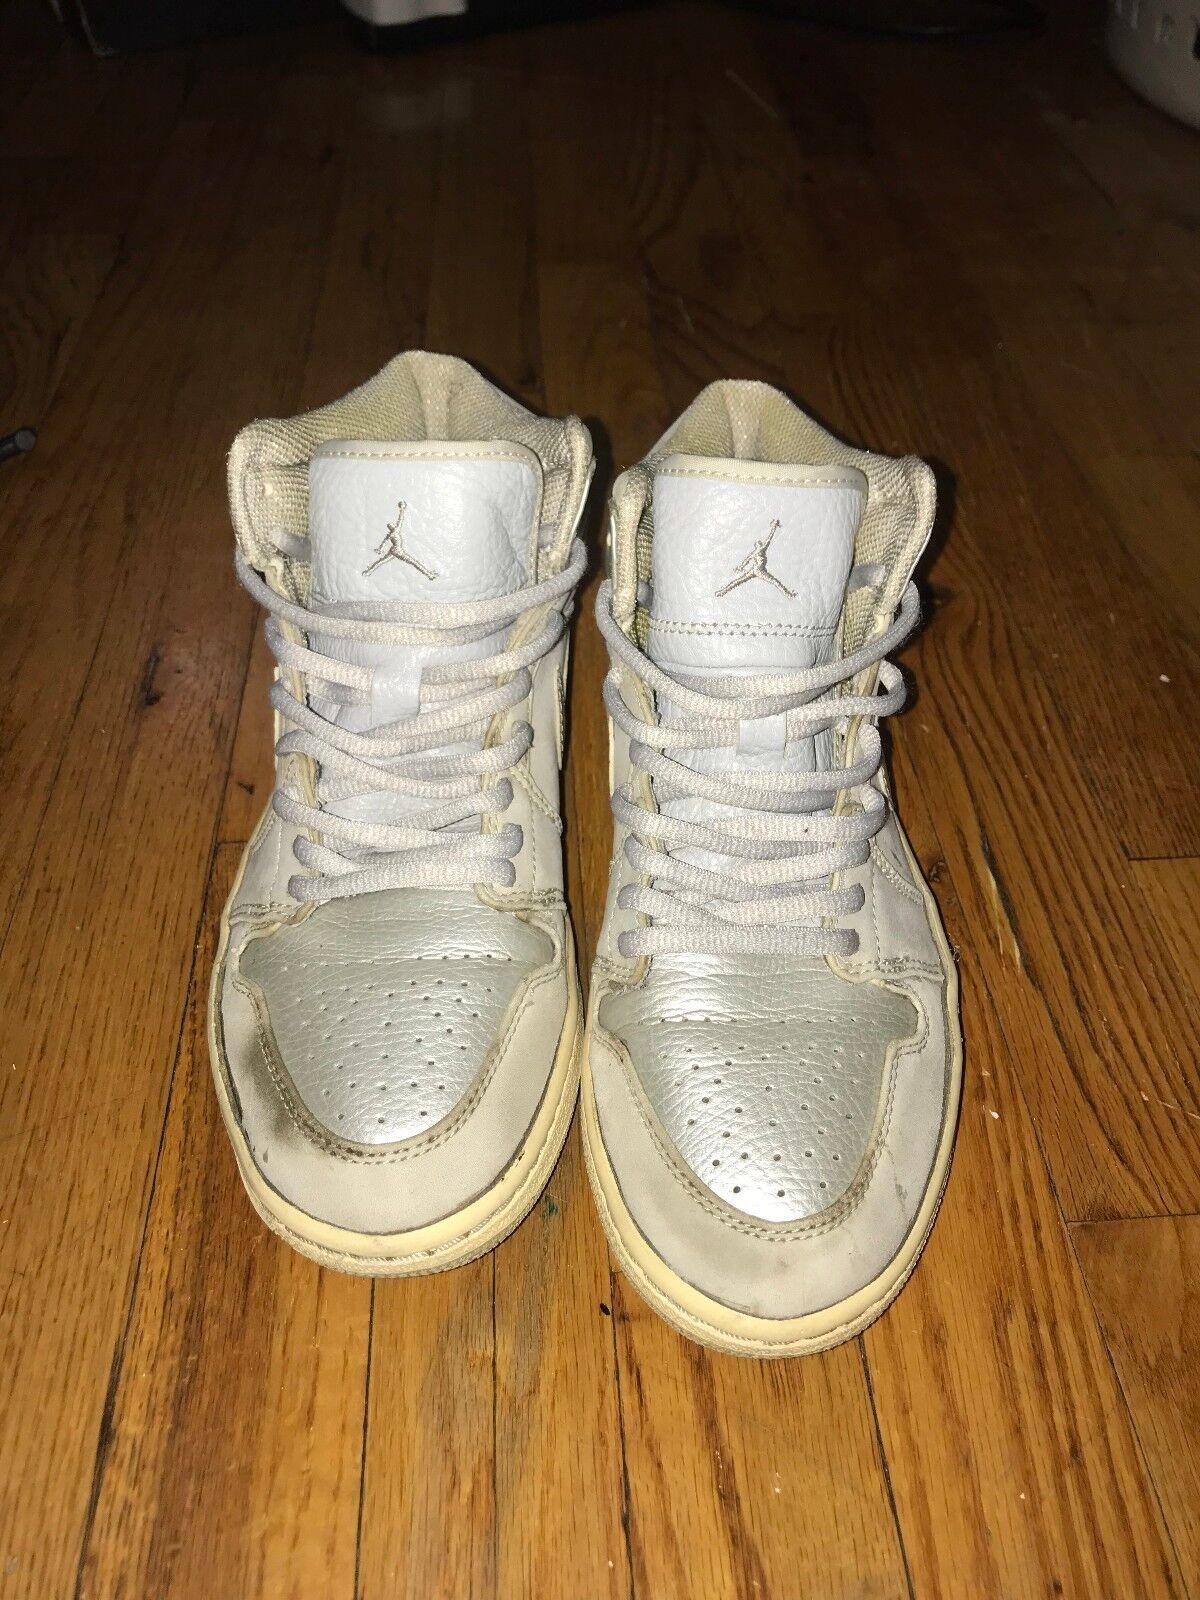 Authentic 2001 Nike Air Jordan 1 Neutral Gray Metallic Silver